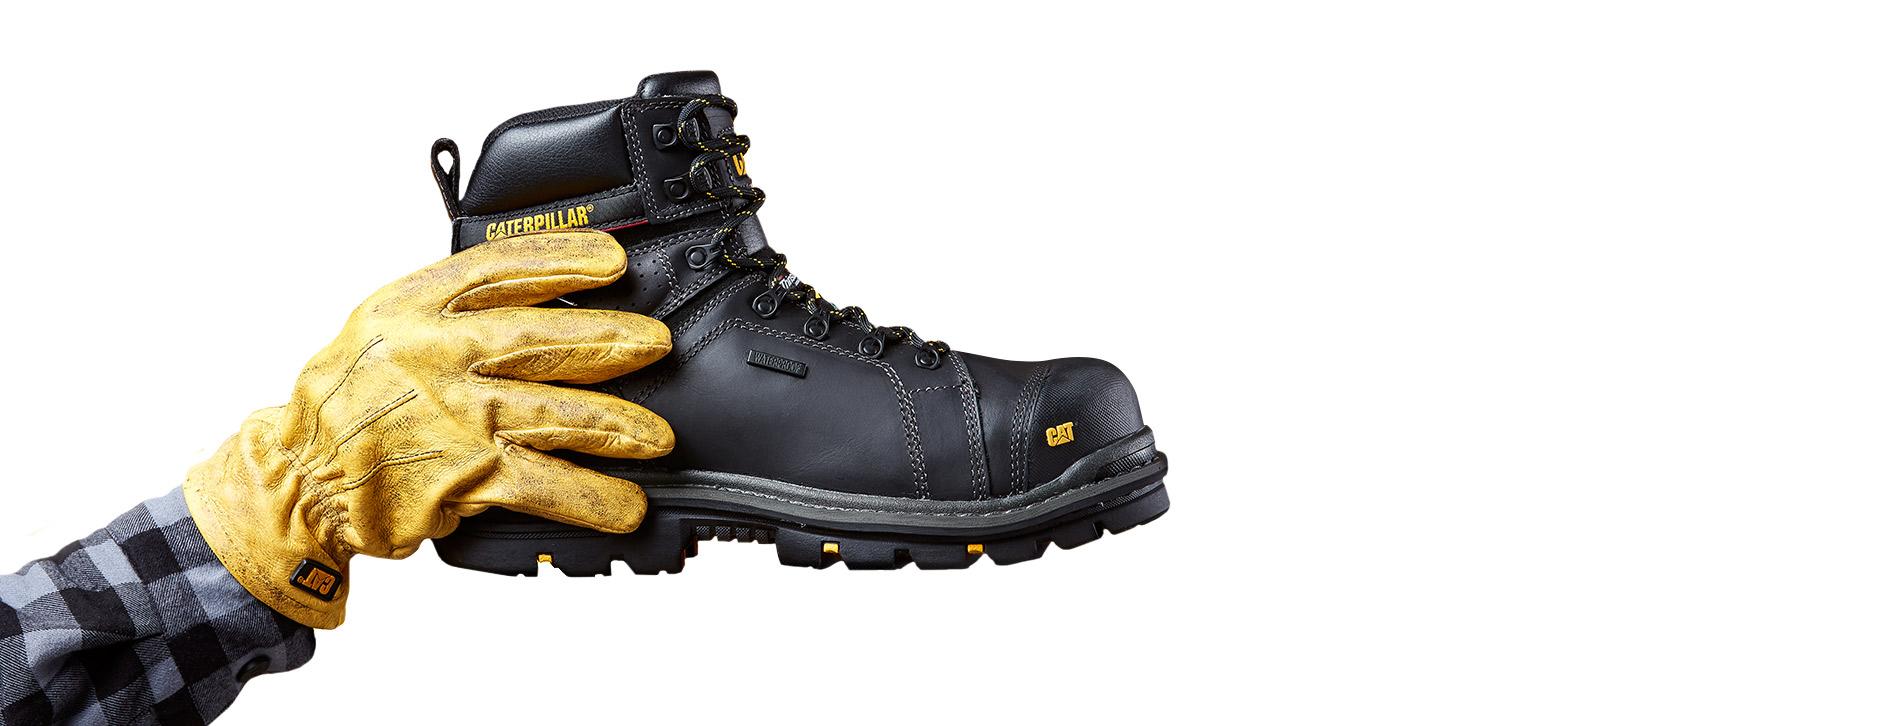 0d75f523b01c31 Caterpillar Work Boots - Comfortable Work Shoes